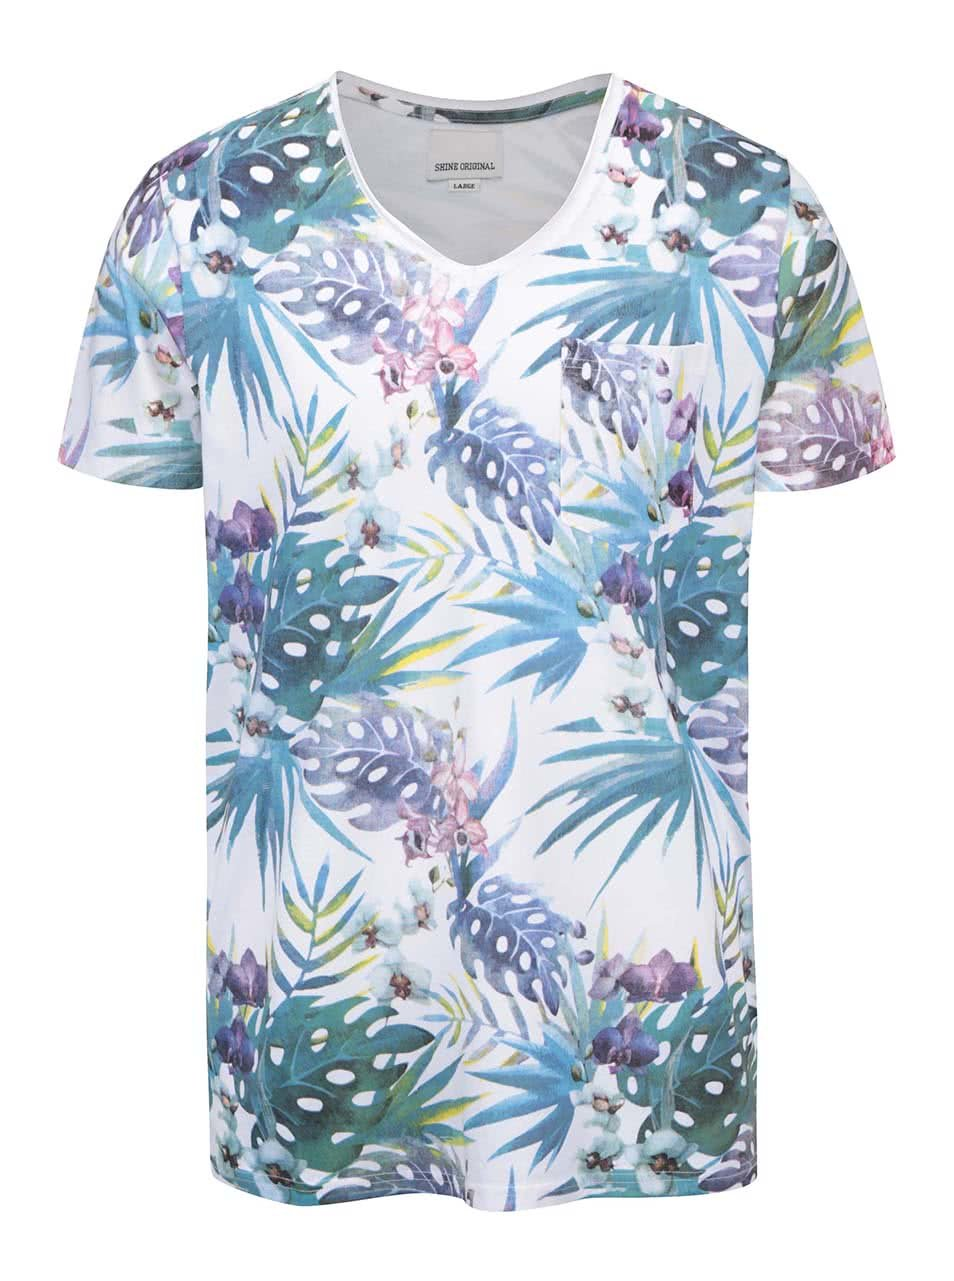 Bílé tričko s barevným potiskem Shine Original